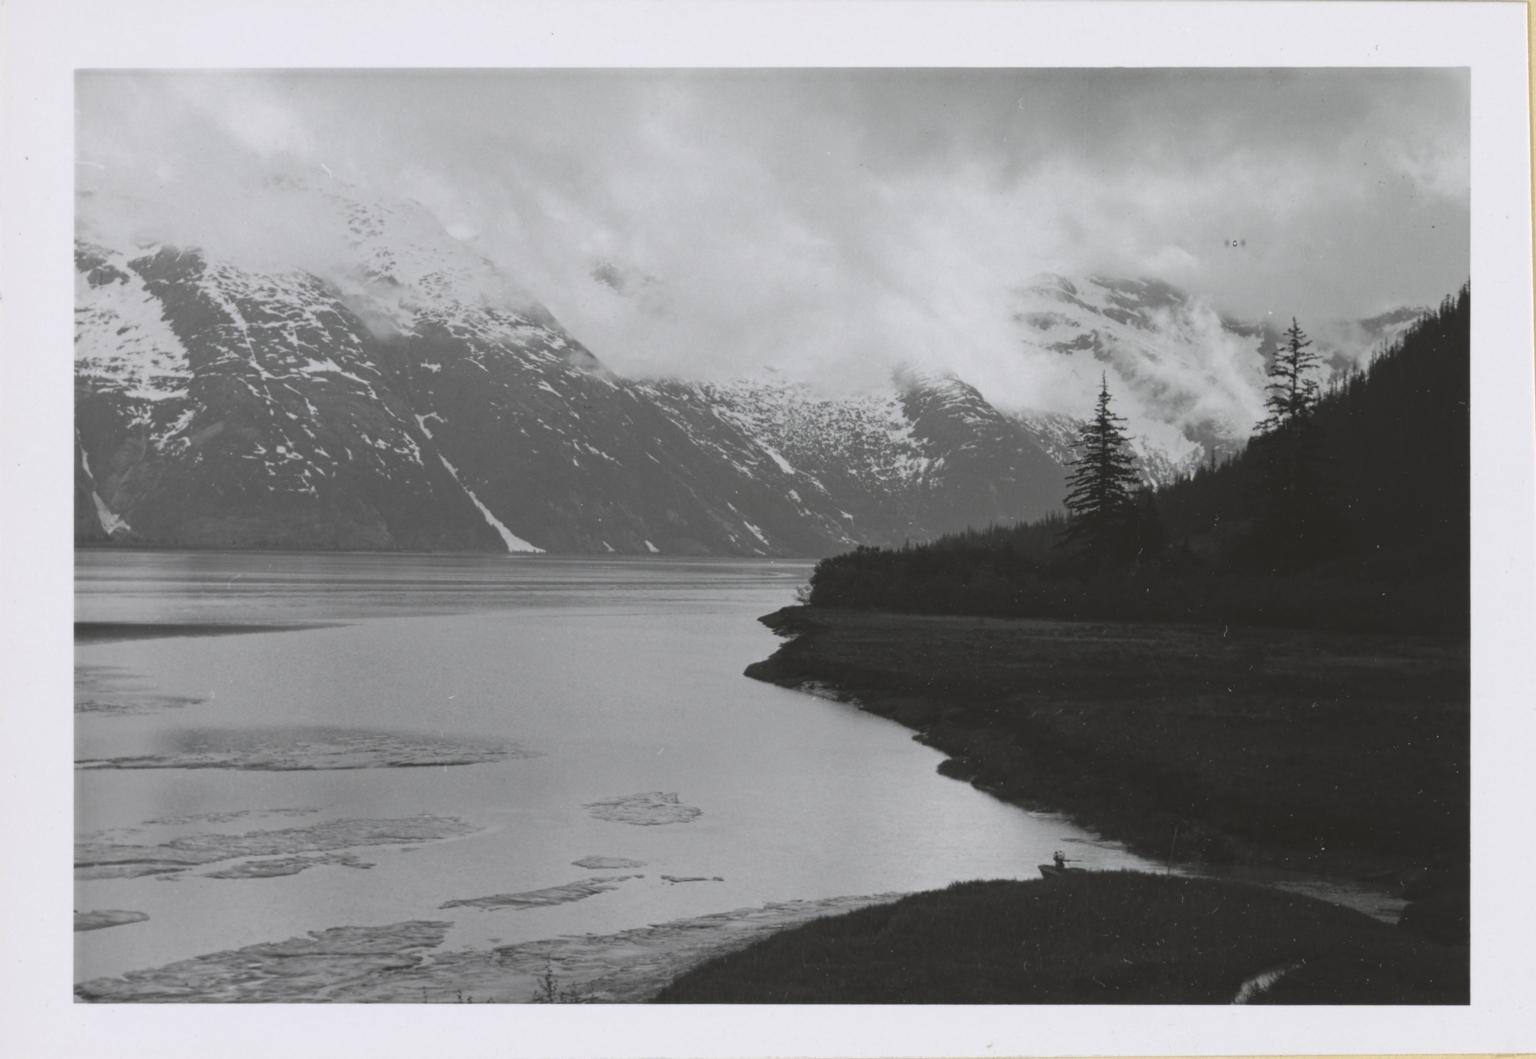 Hole-in-the-Wall Glacier, Alaska